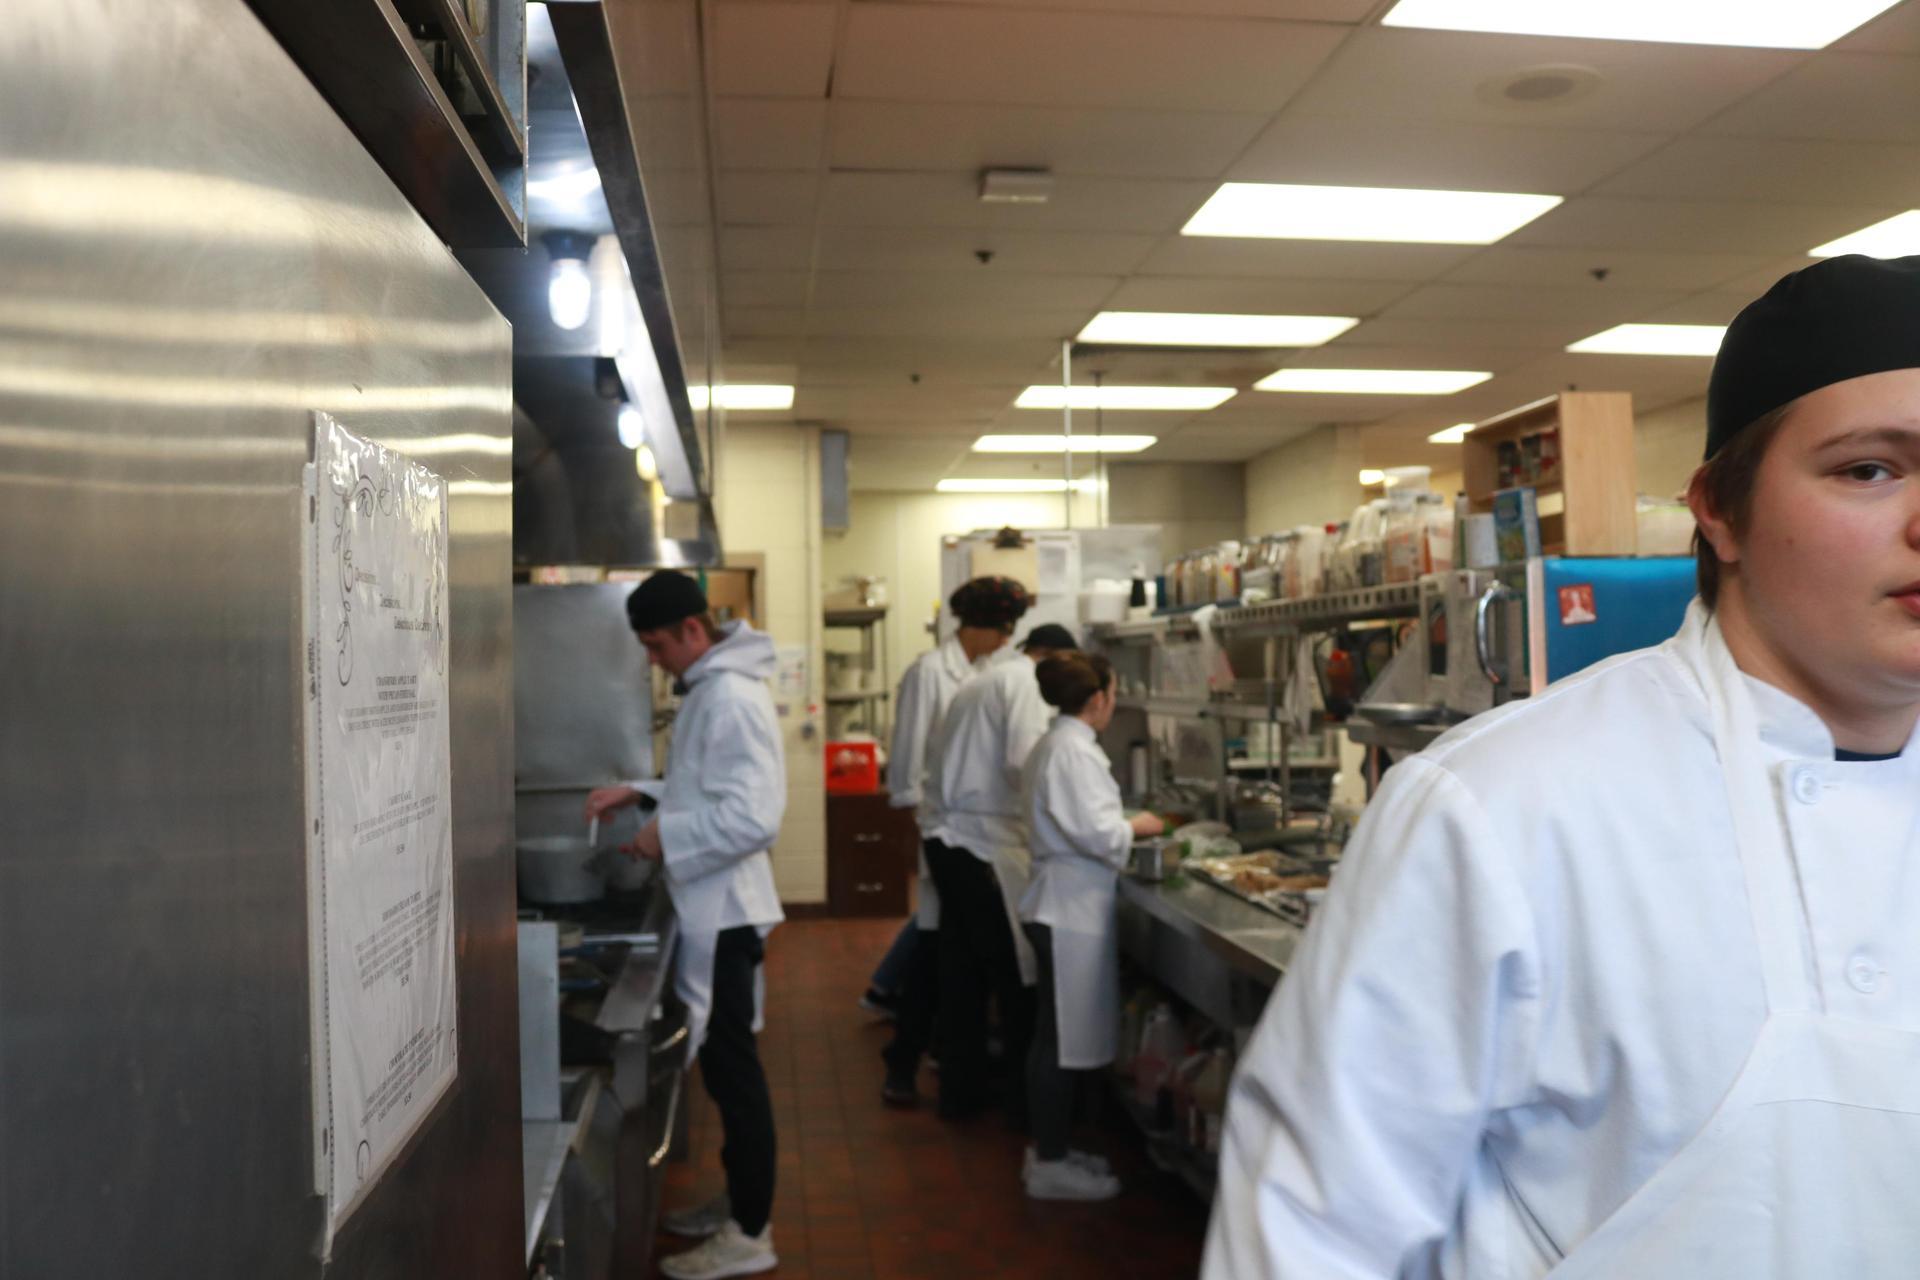 Students on kitchen line